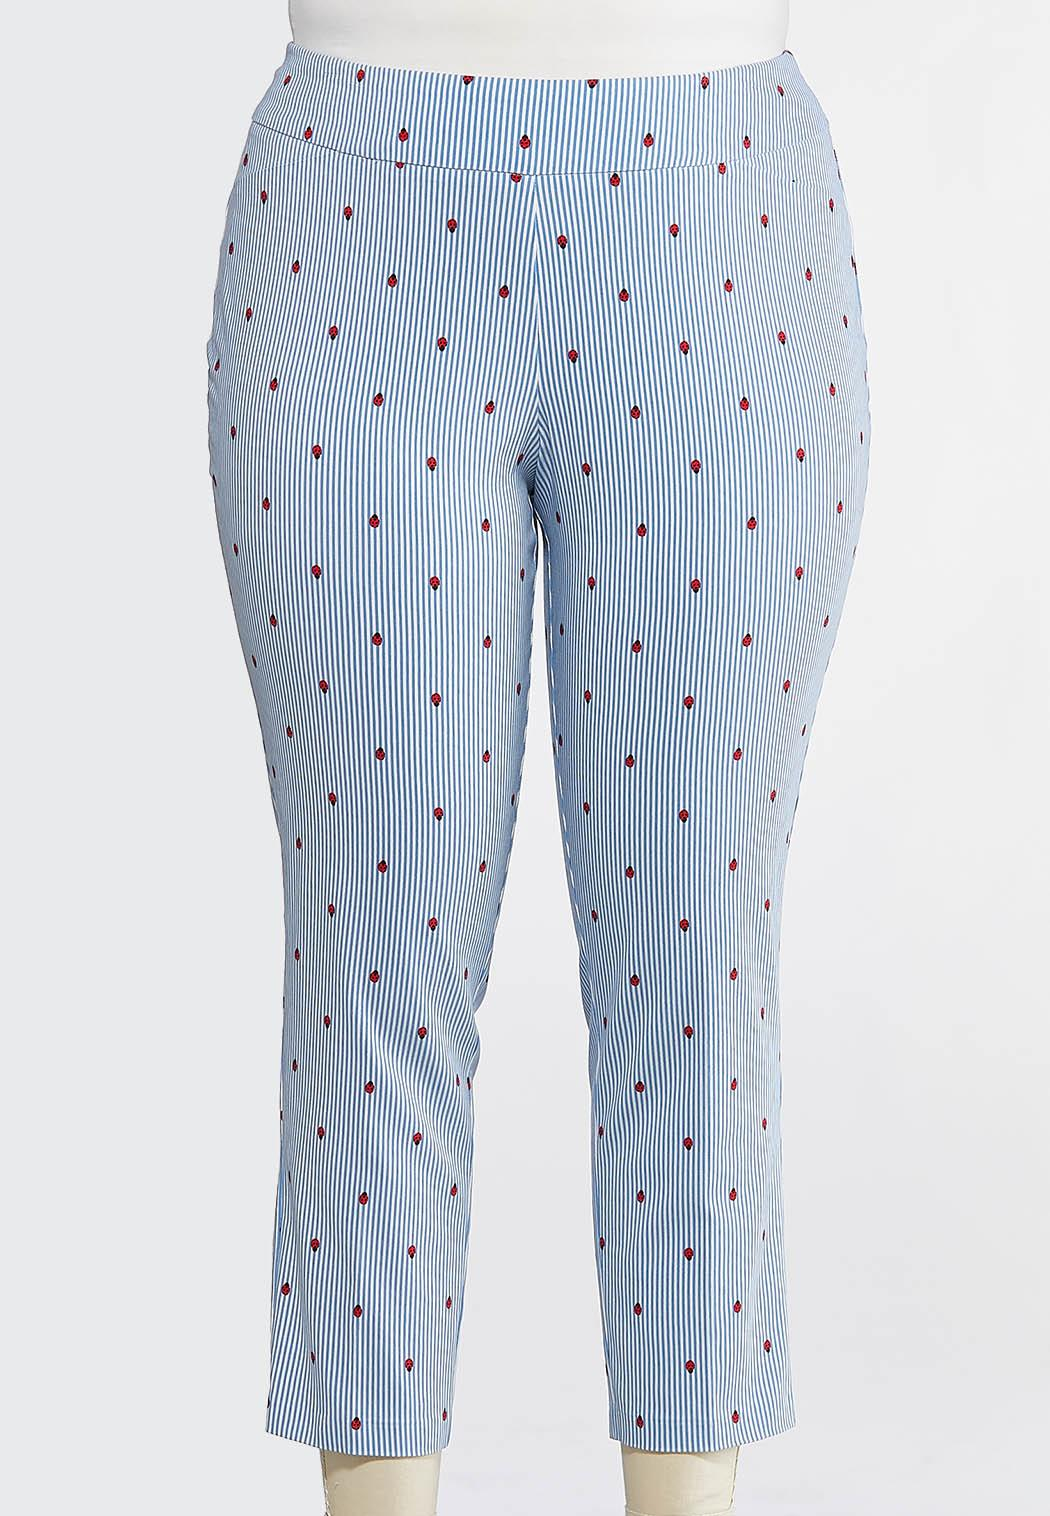 84a7a98f59 Plus Size Ladybug Bengaline Pants alternate view Plus Size Ladybug  Bengaline Pants